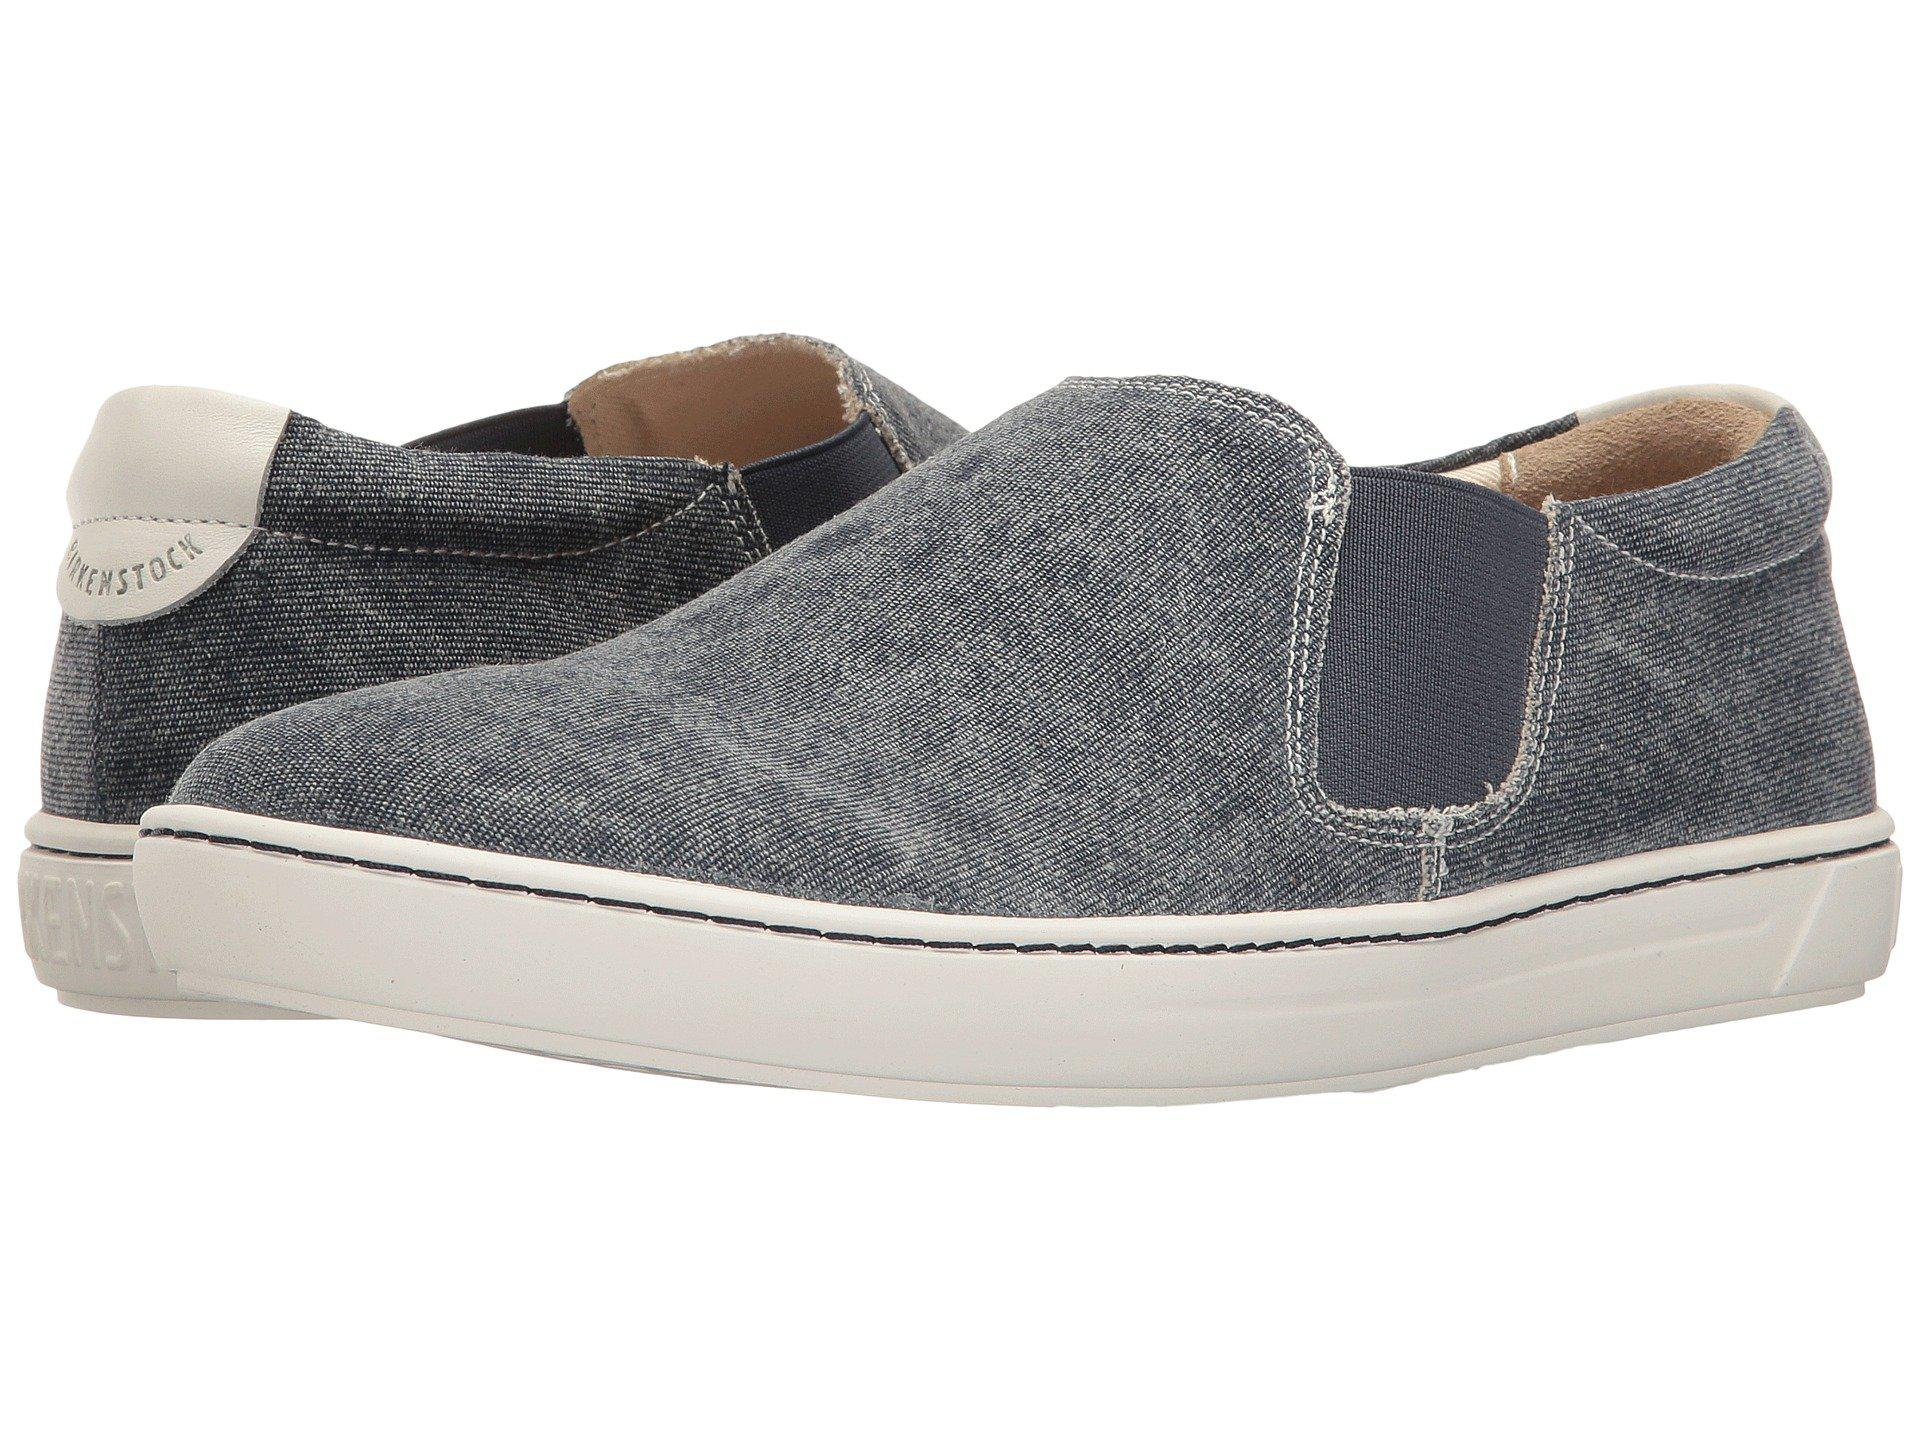 26cc908e44d3 Lyst - Birkenstock Barrie (sand Canvas) Women s Shoes in Blue